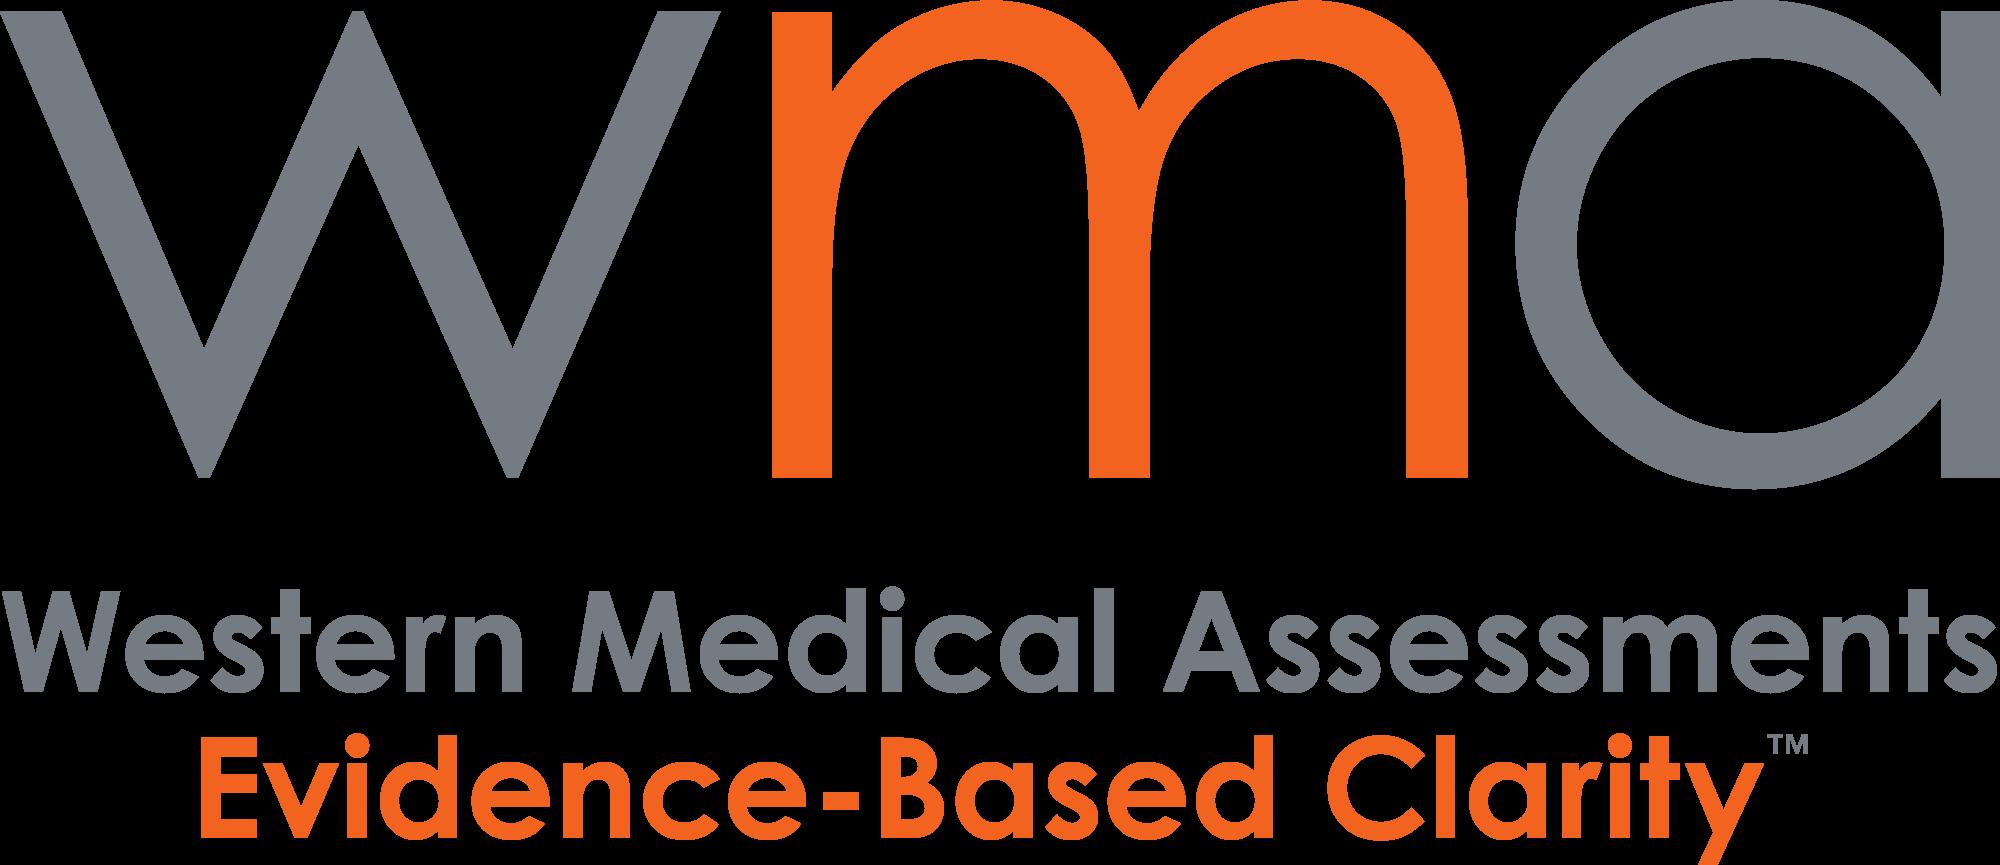 Western Medical Assessments